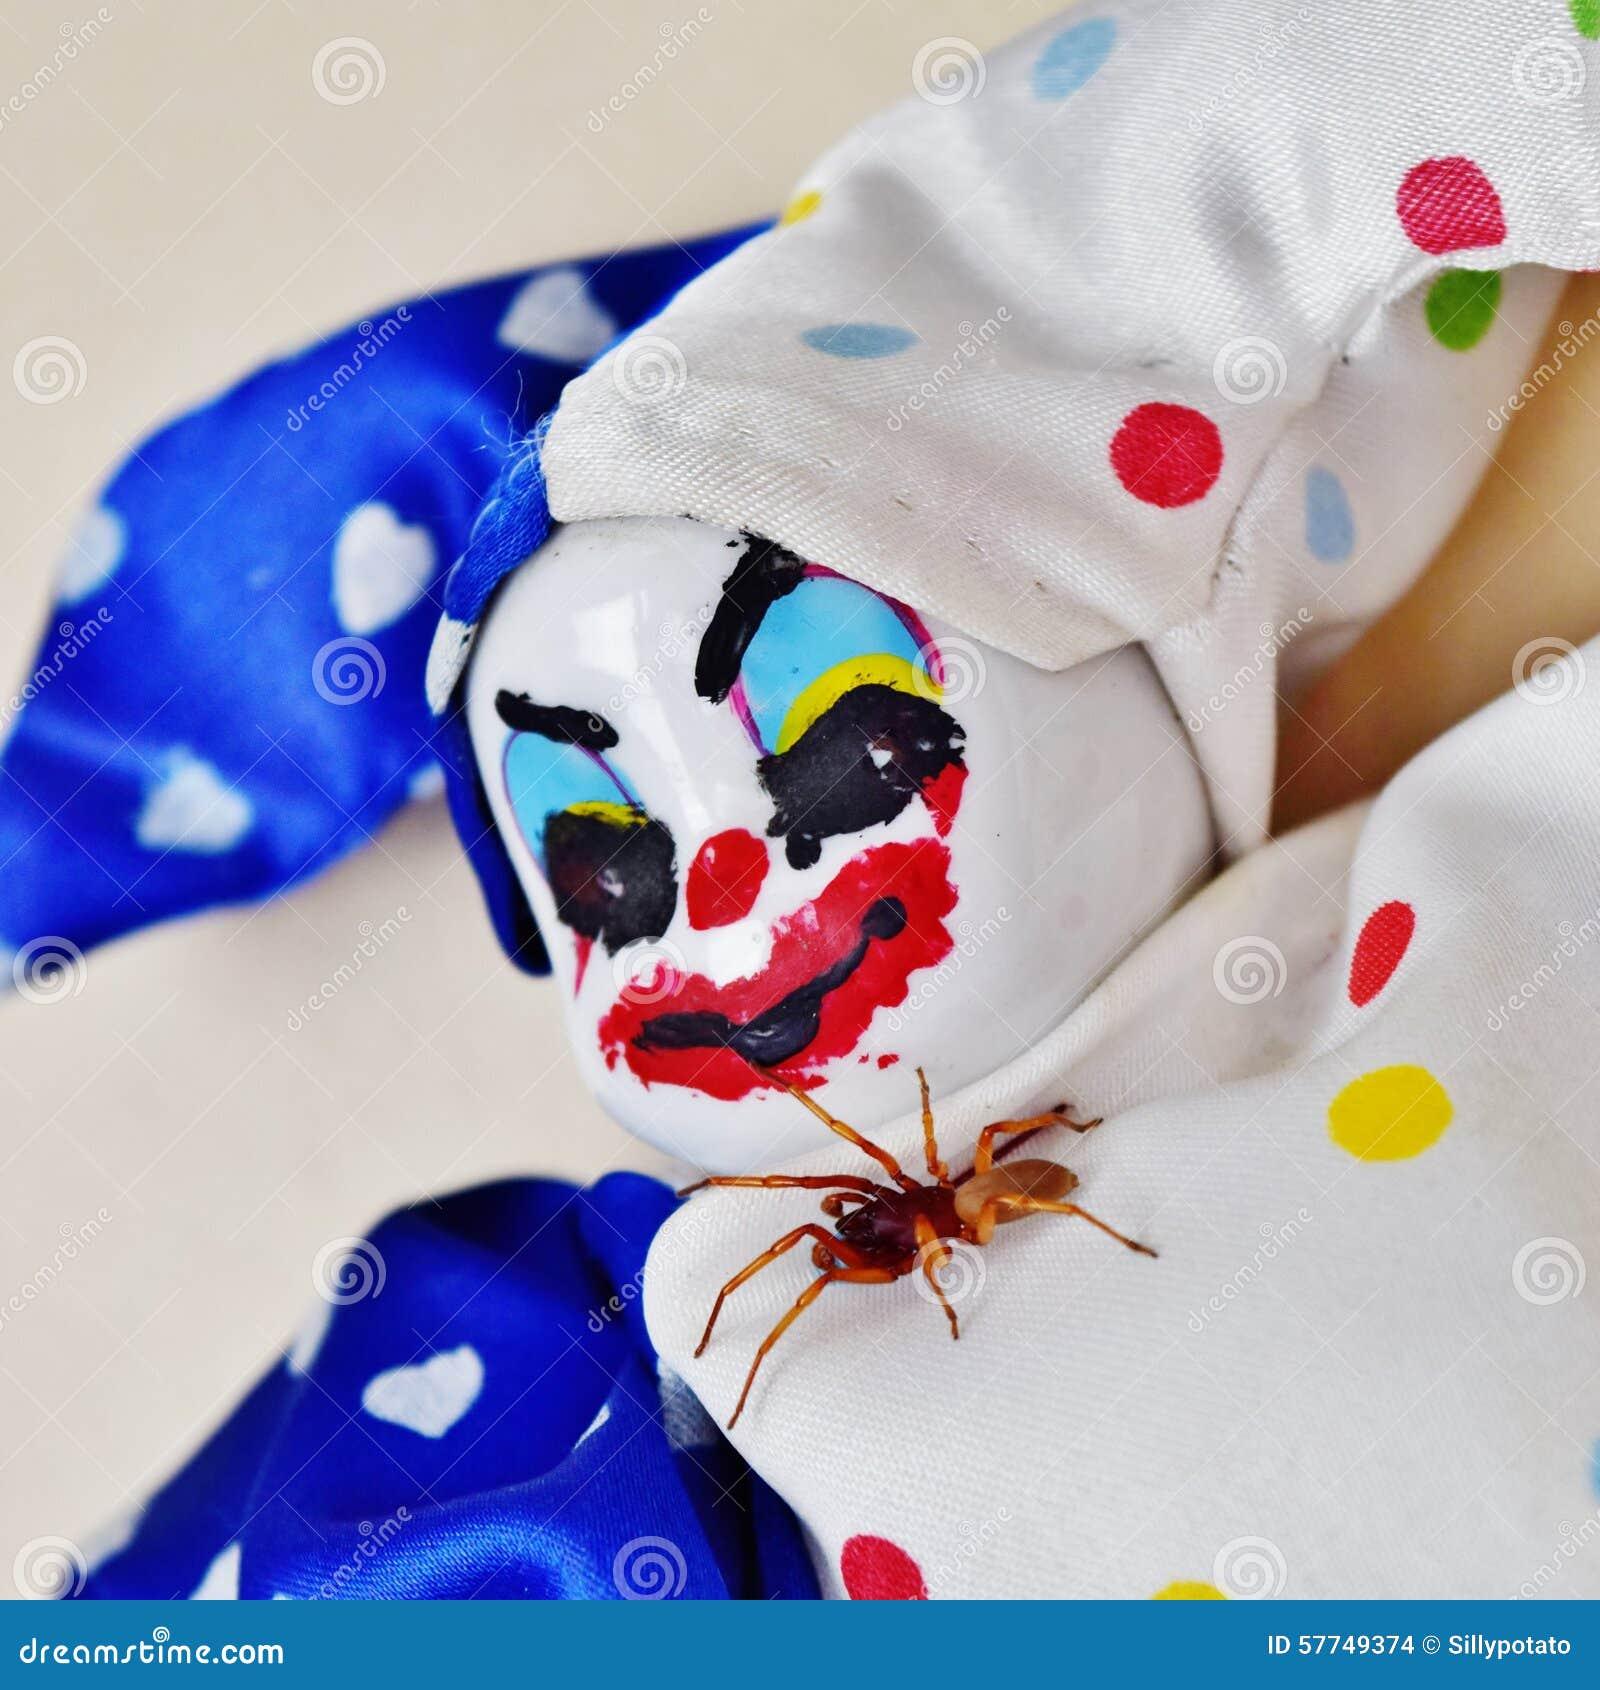 Страшная кукла клоуна с другом паука